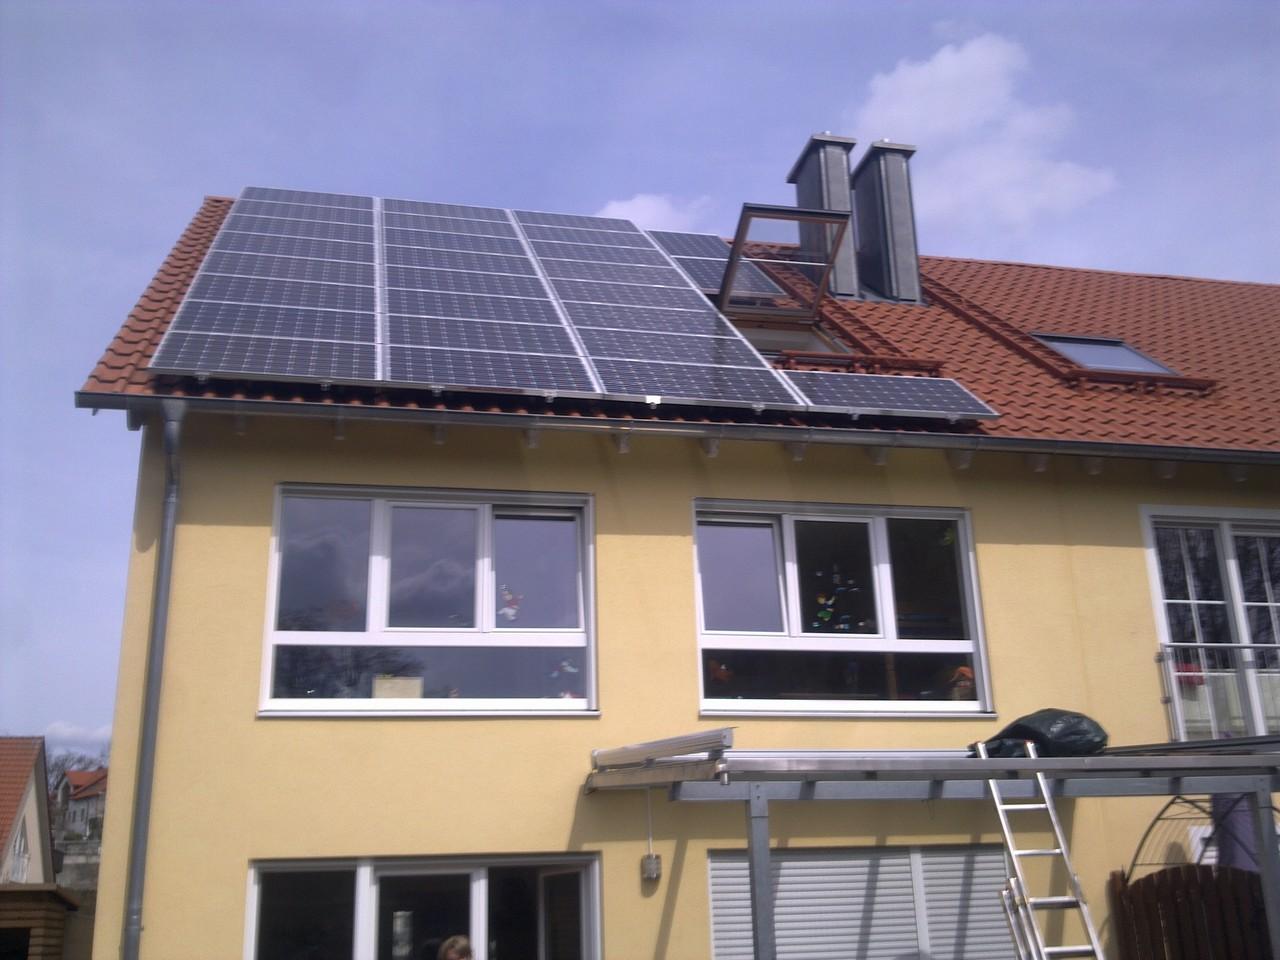 7,15 kWp Photovoltaikanlage in 93138 Lappersdorf